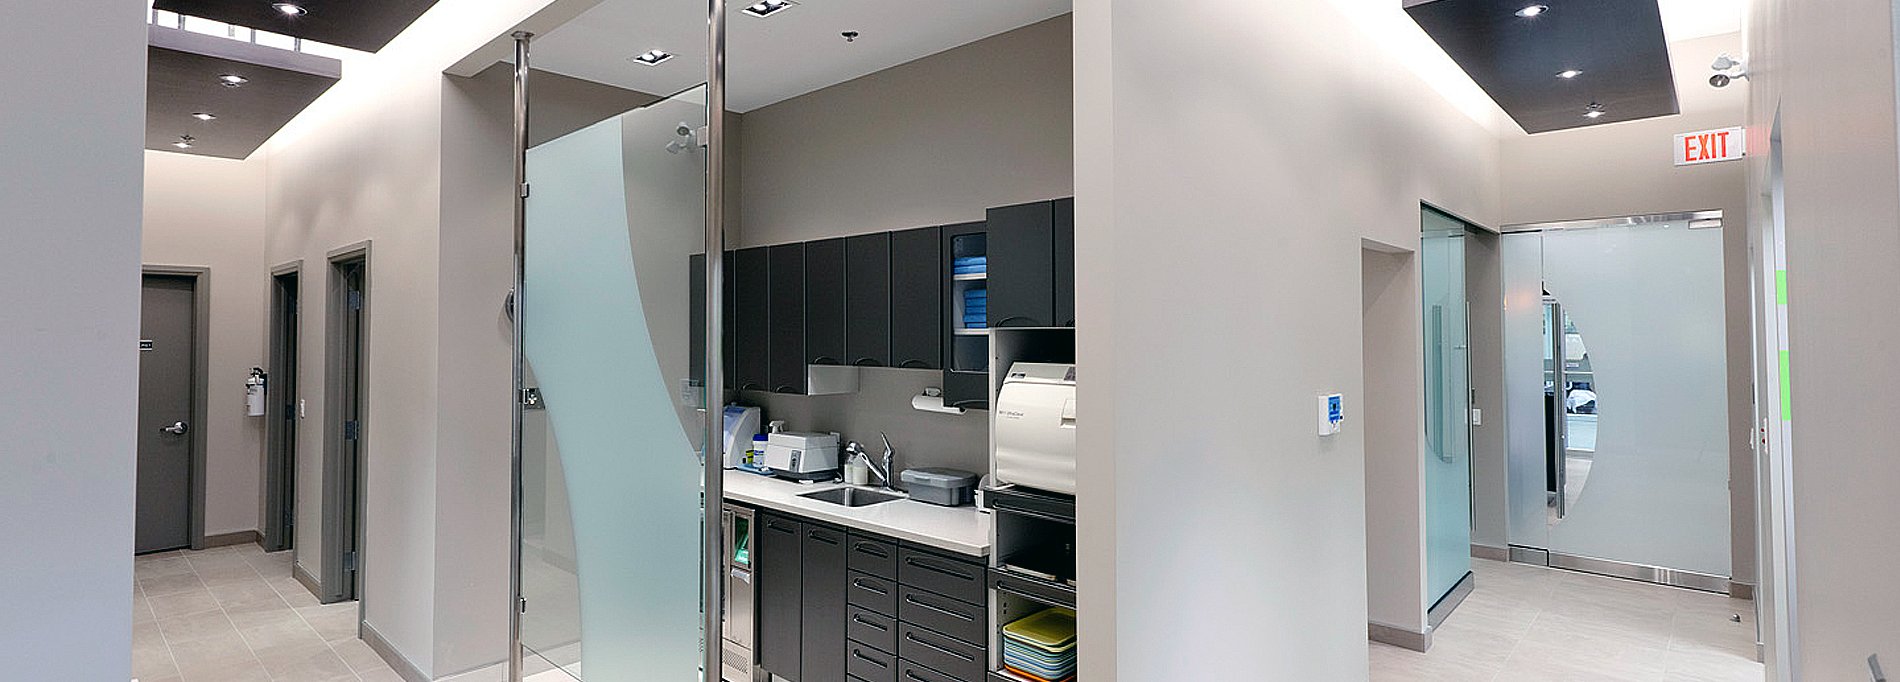 Mint Dental Clinic - Burlington Dentist Office - Sterilization Area Photo